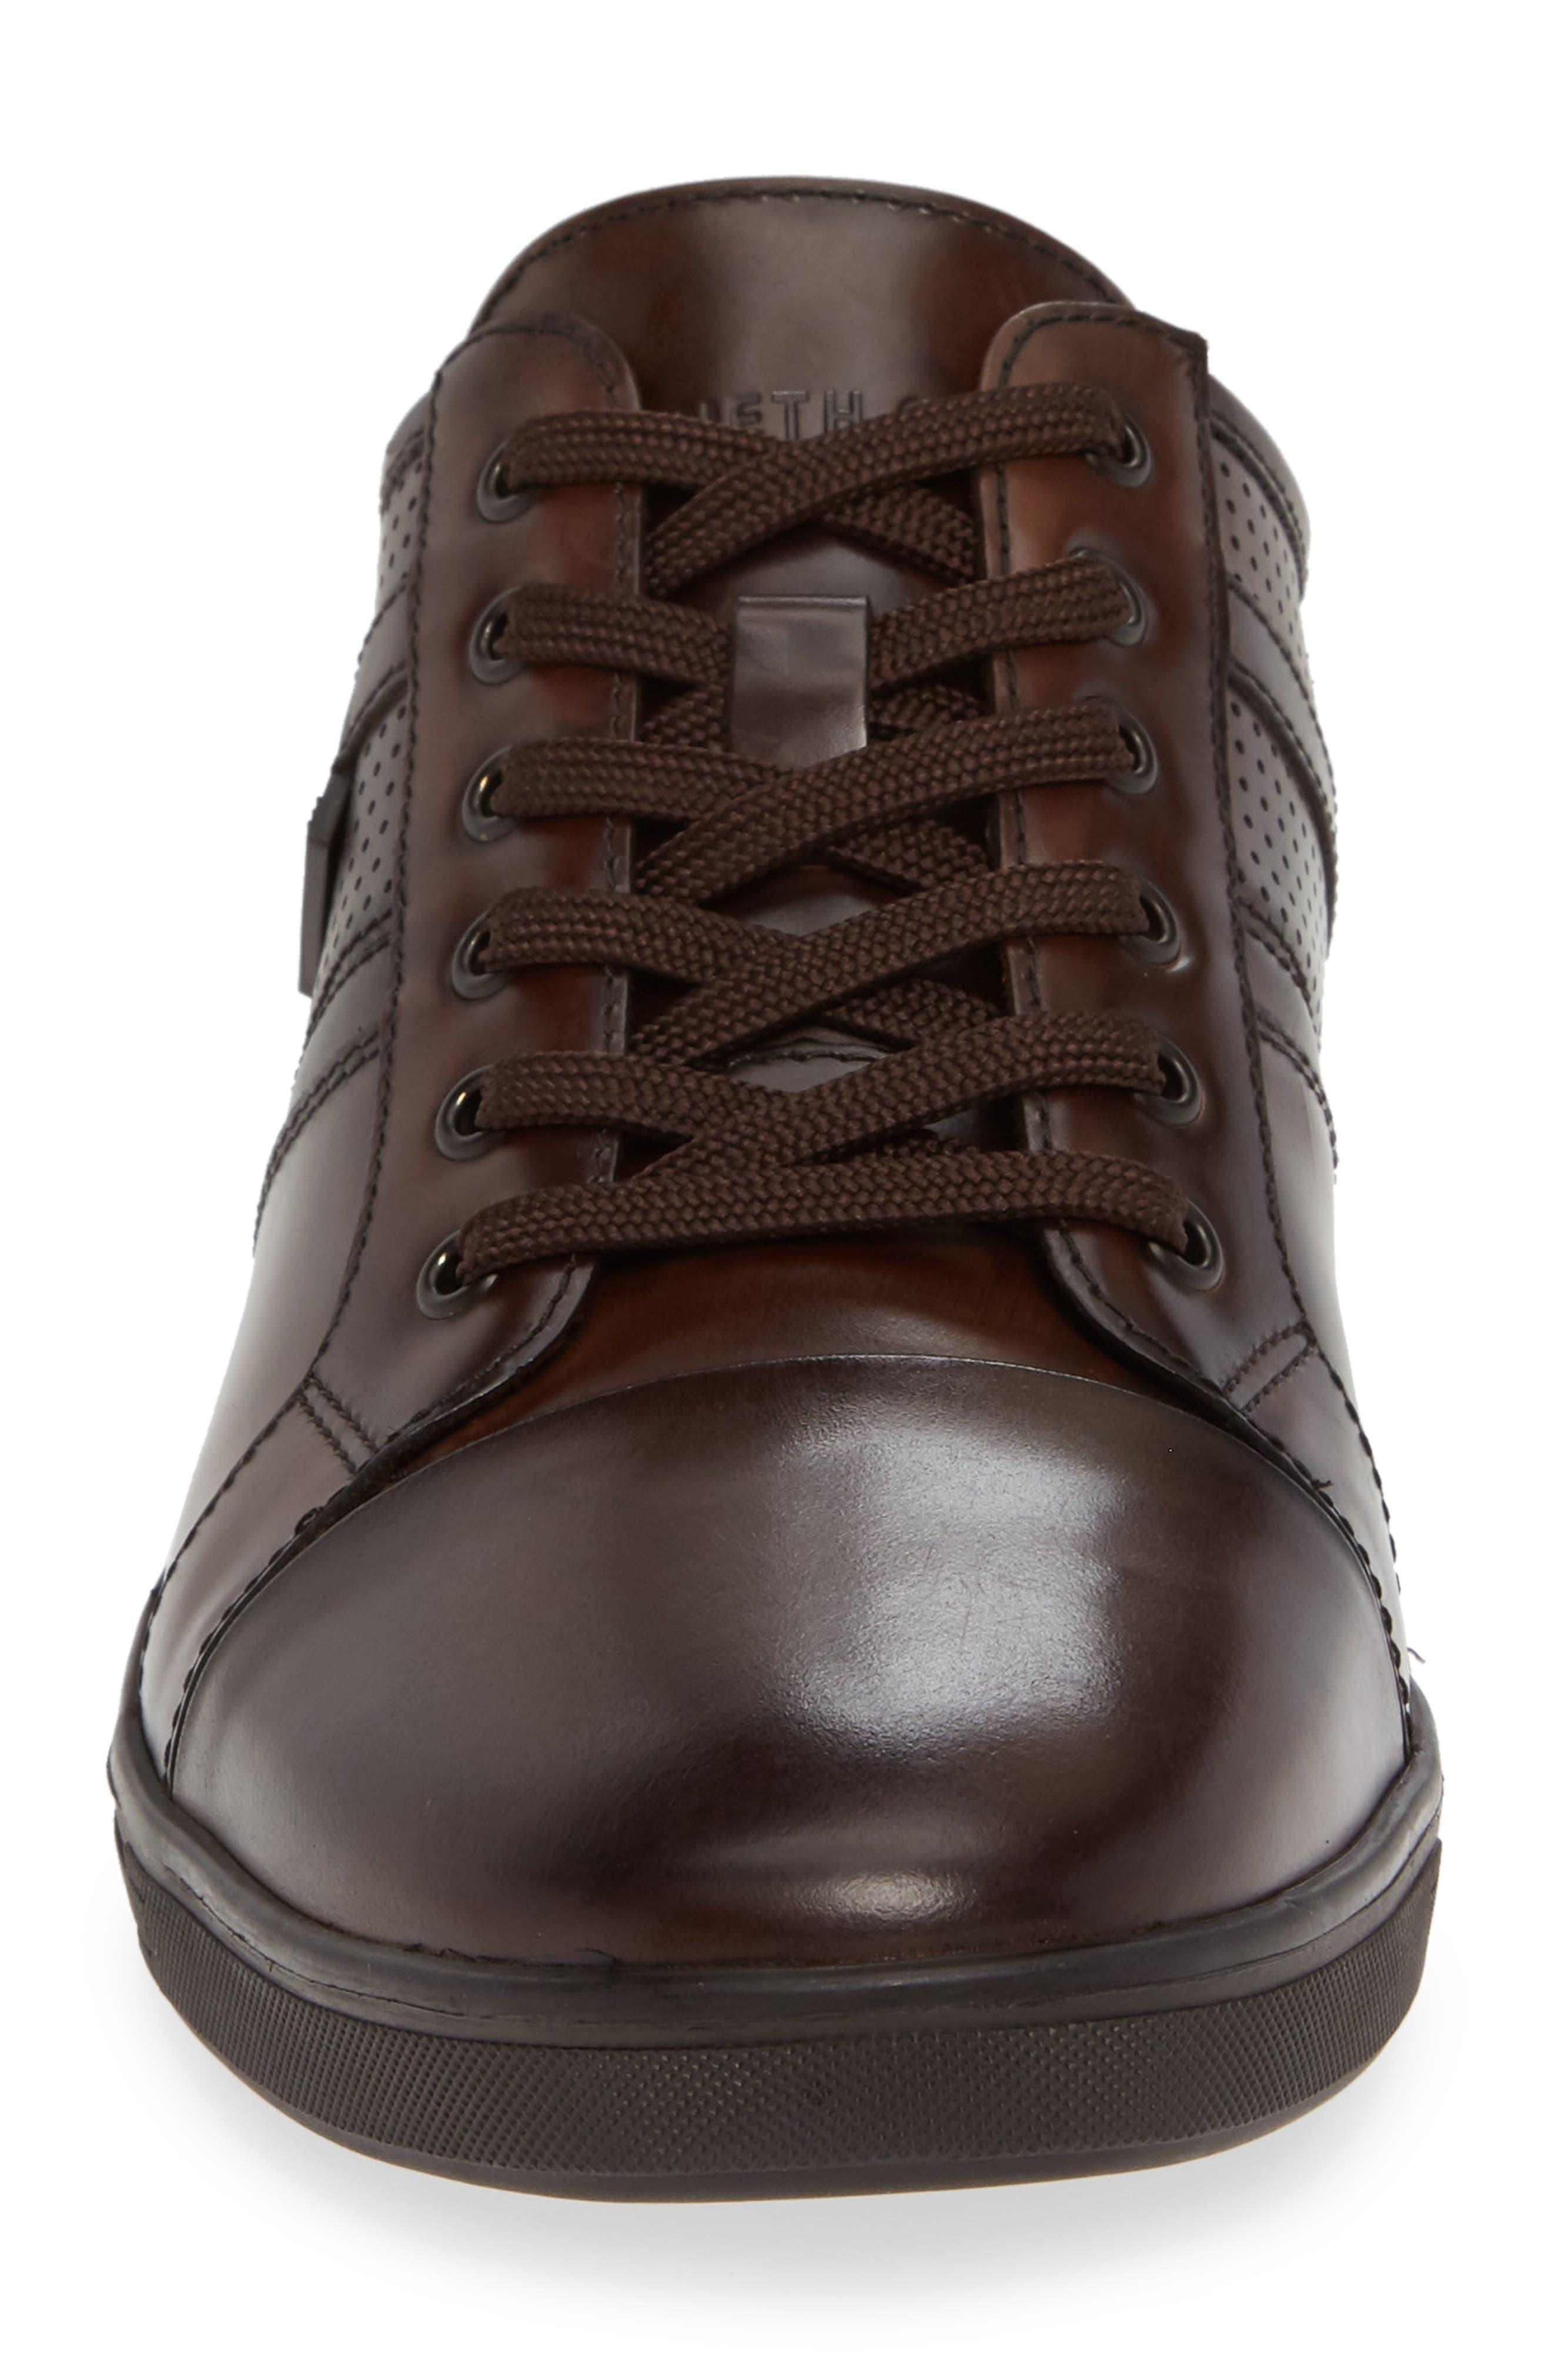 Initial Step Sneaker,                             Alternate thumbnail 4, color,                             200